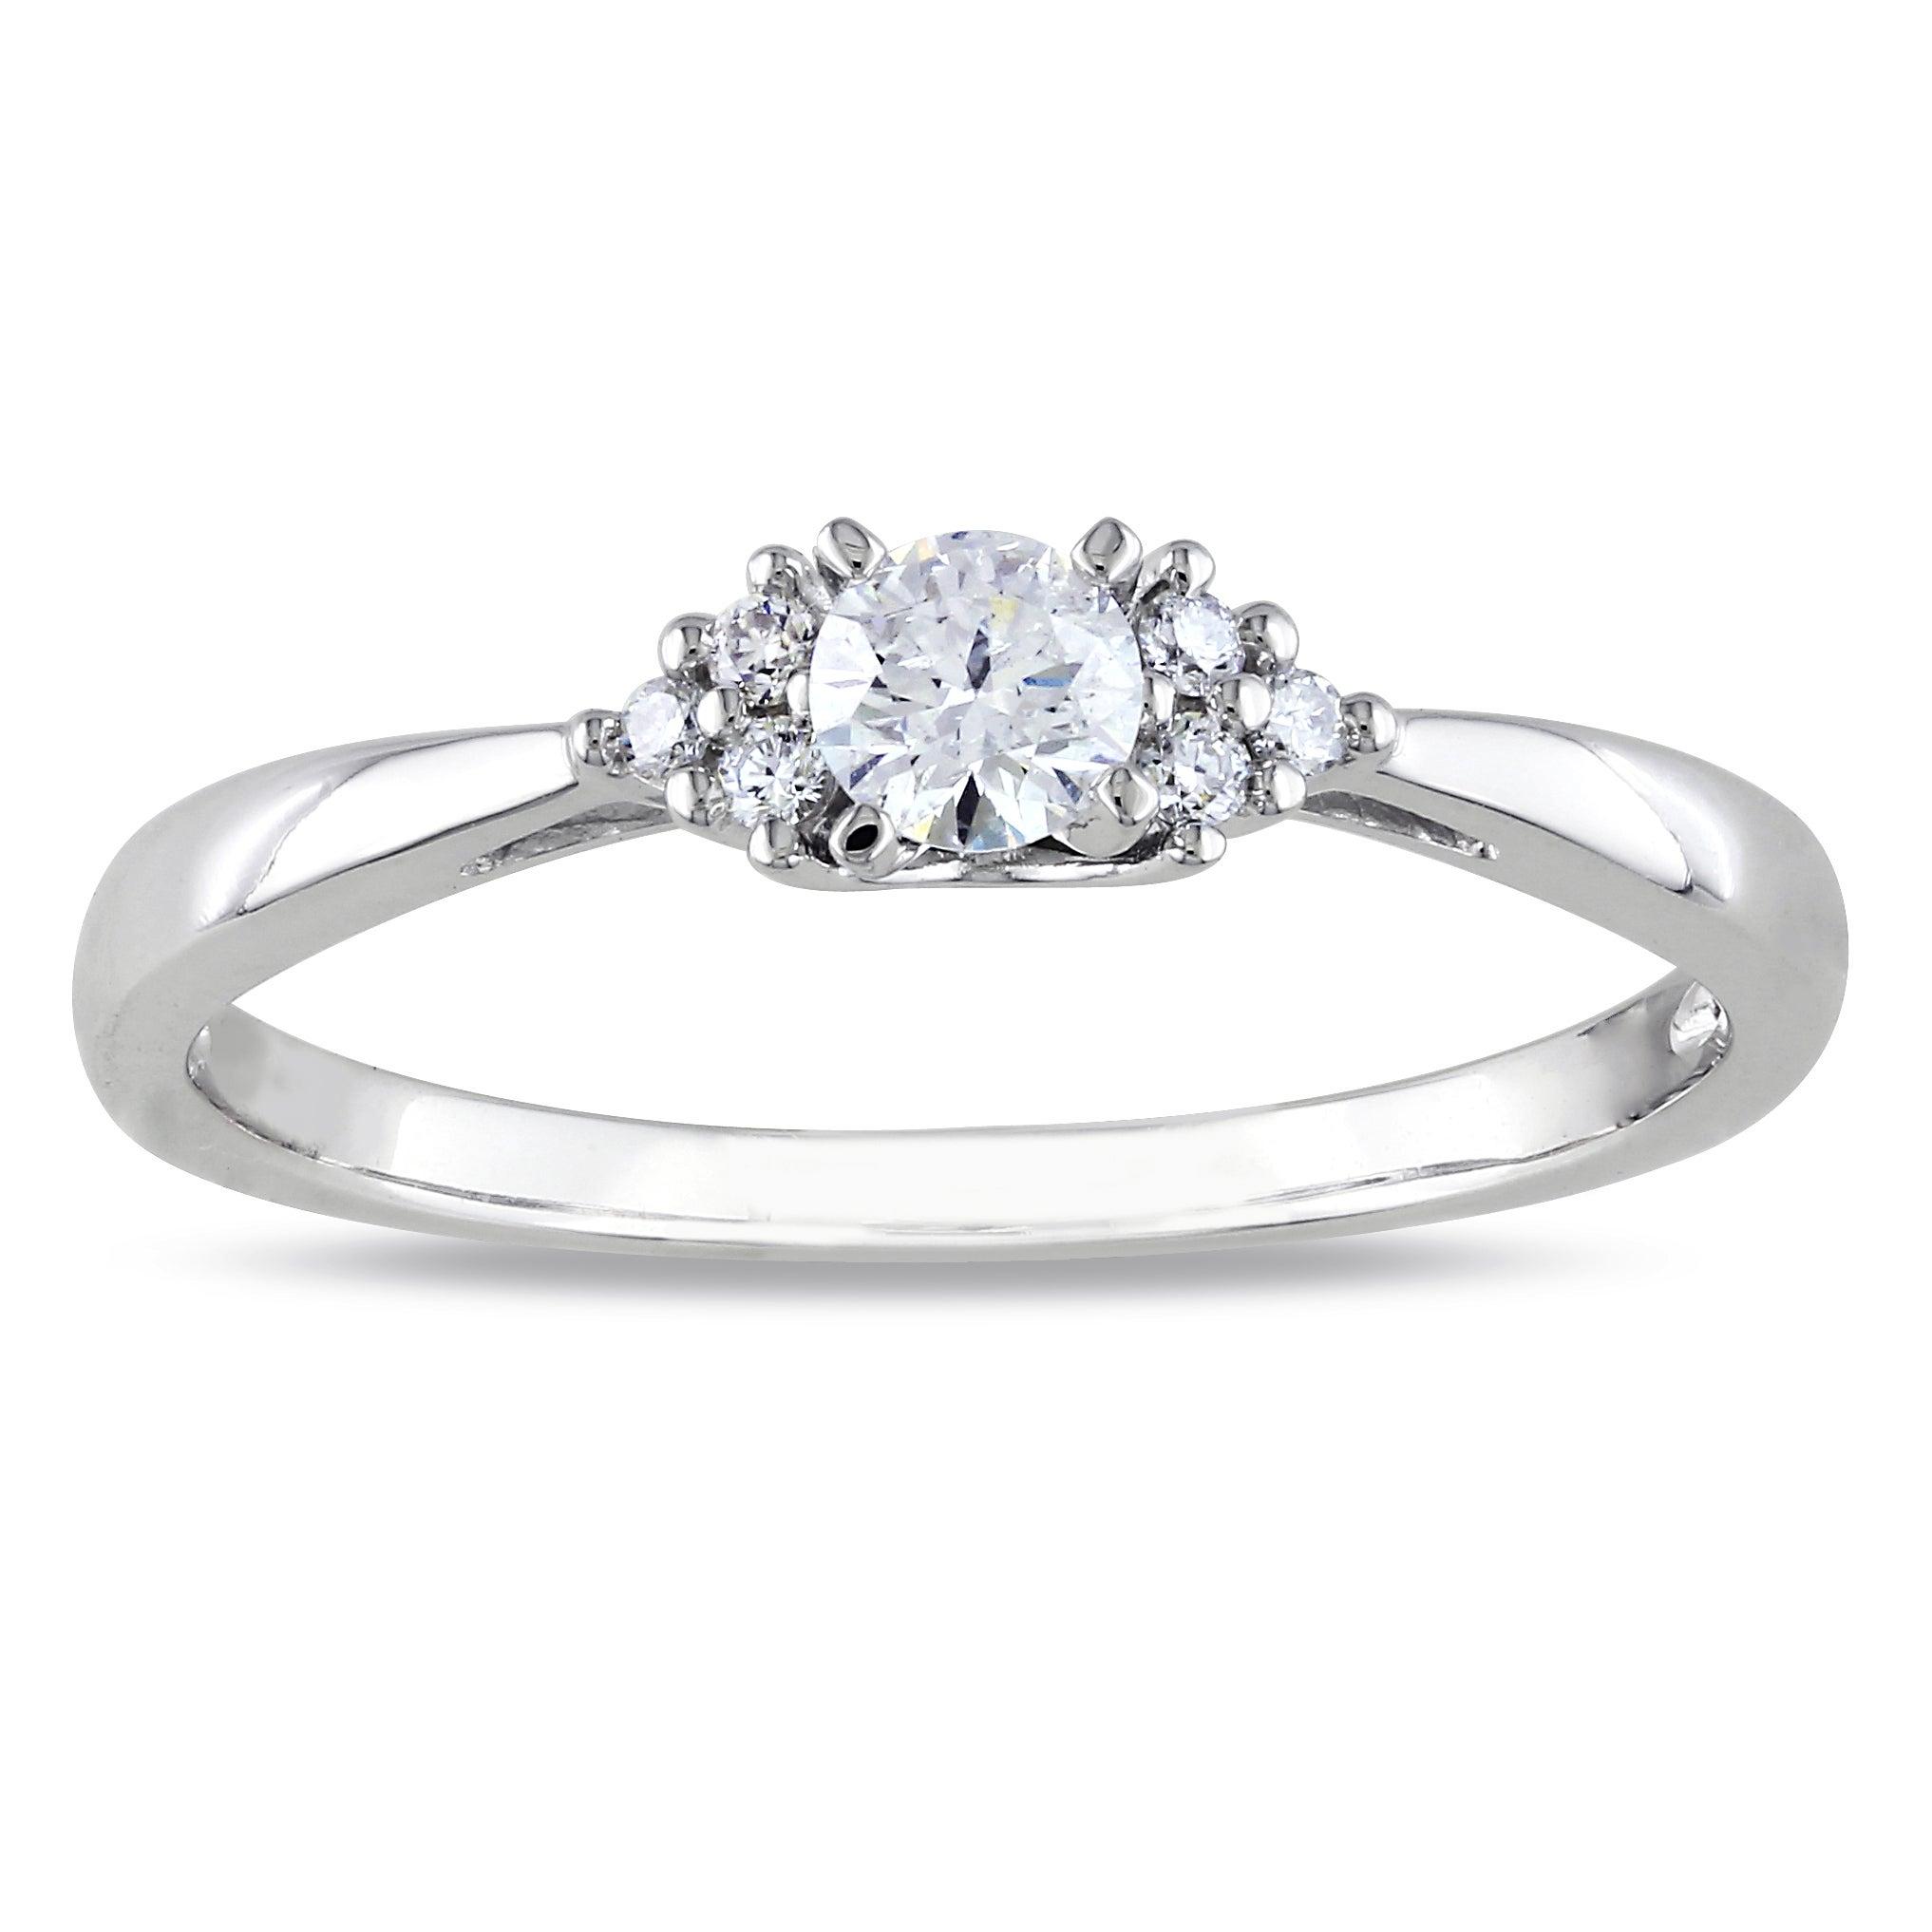 Miadora 14k White Gold 1/4ct TDW Round Diamond Ring (G-H, I1-I2)